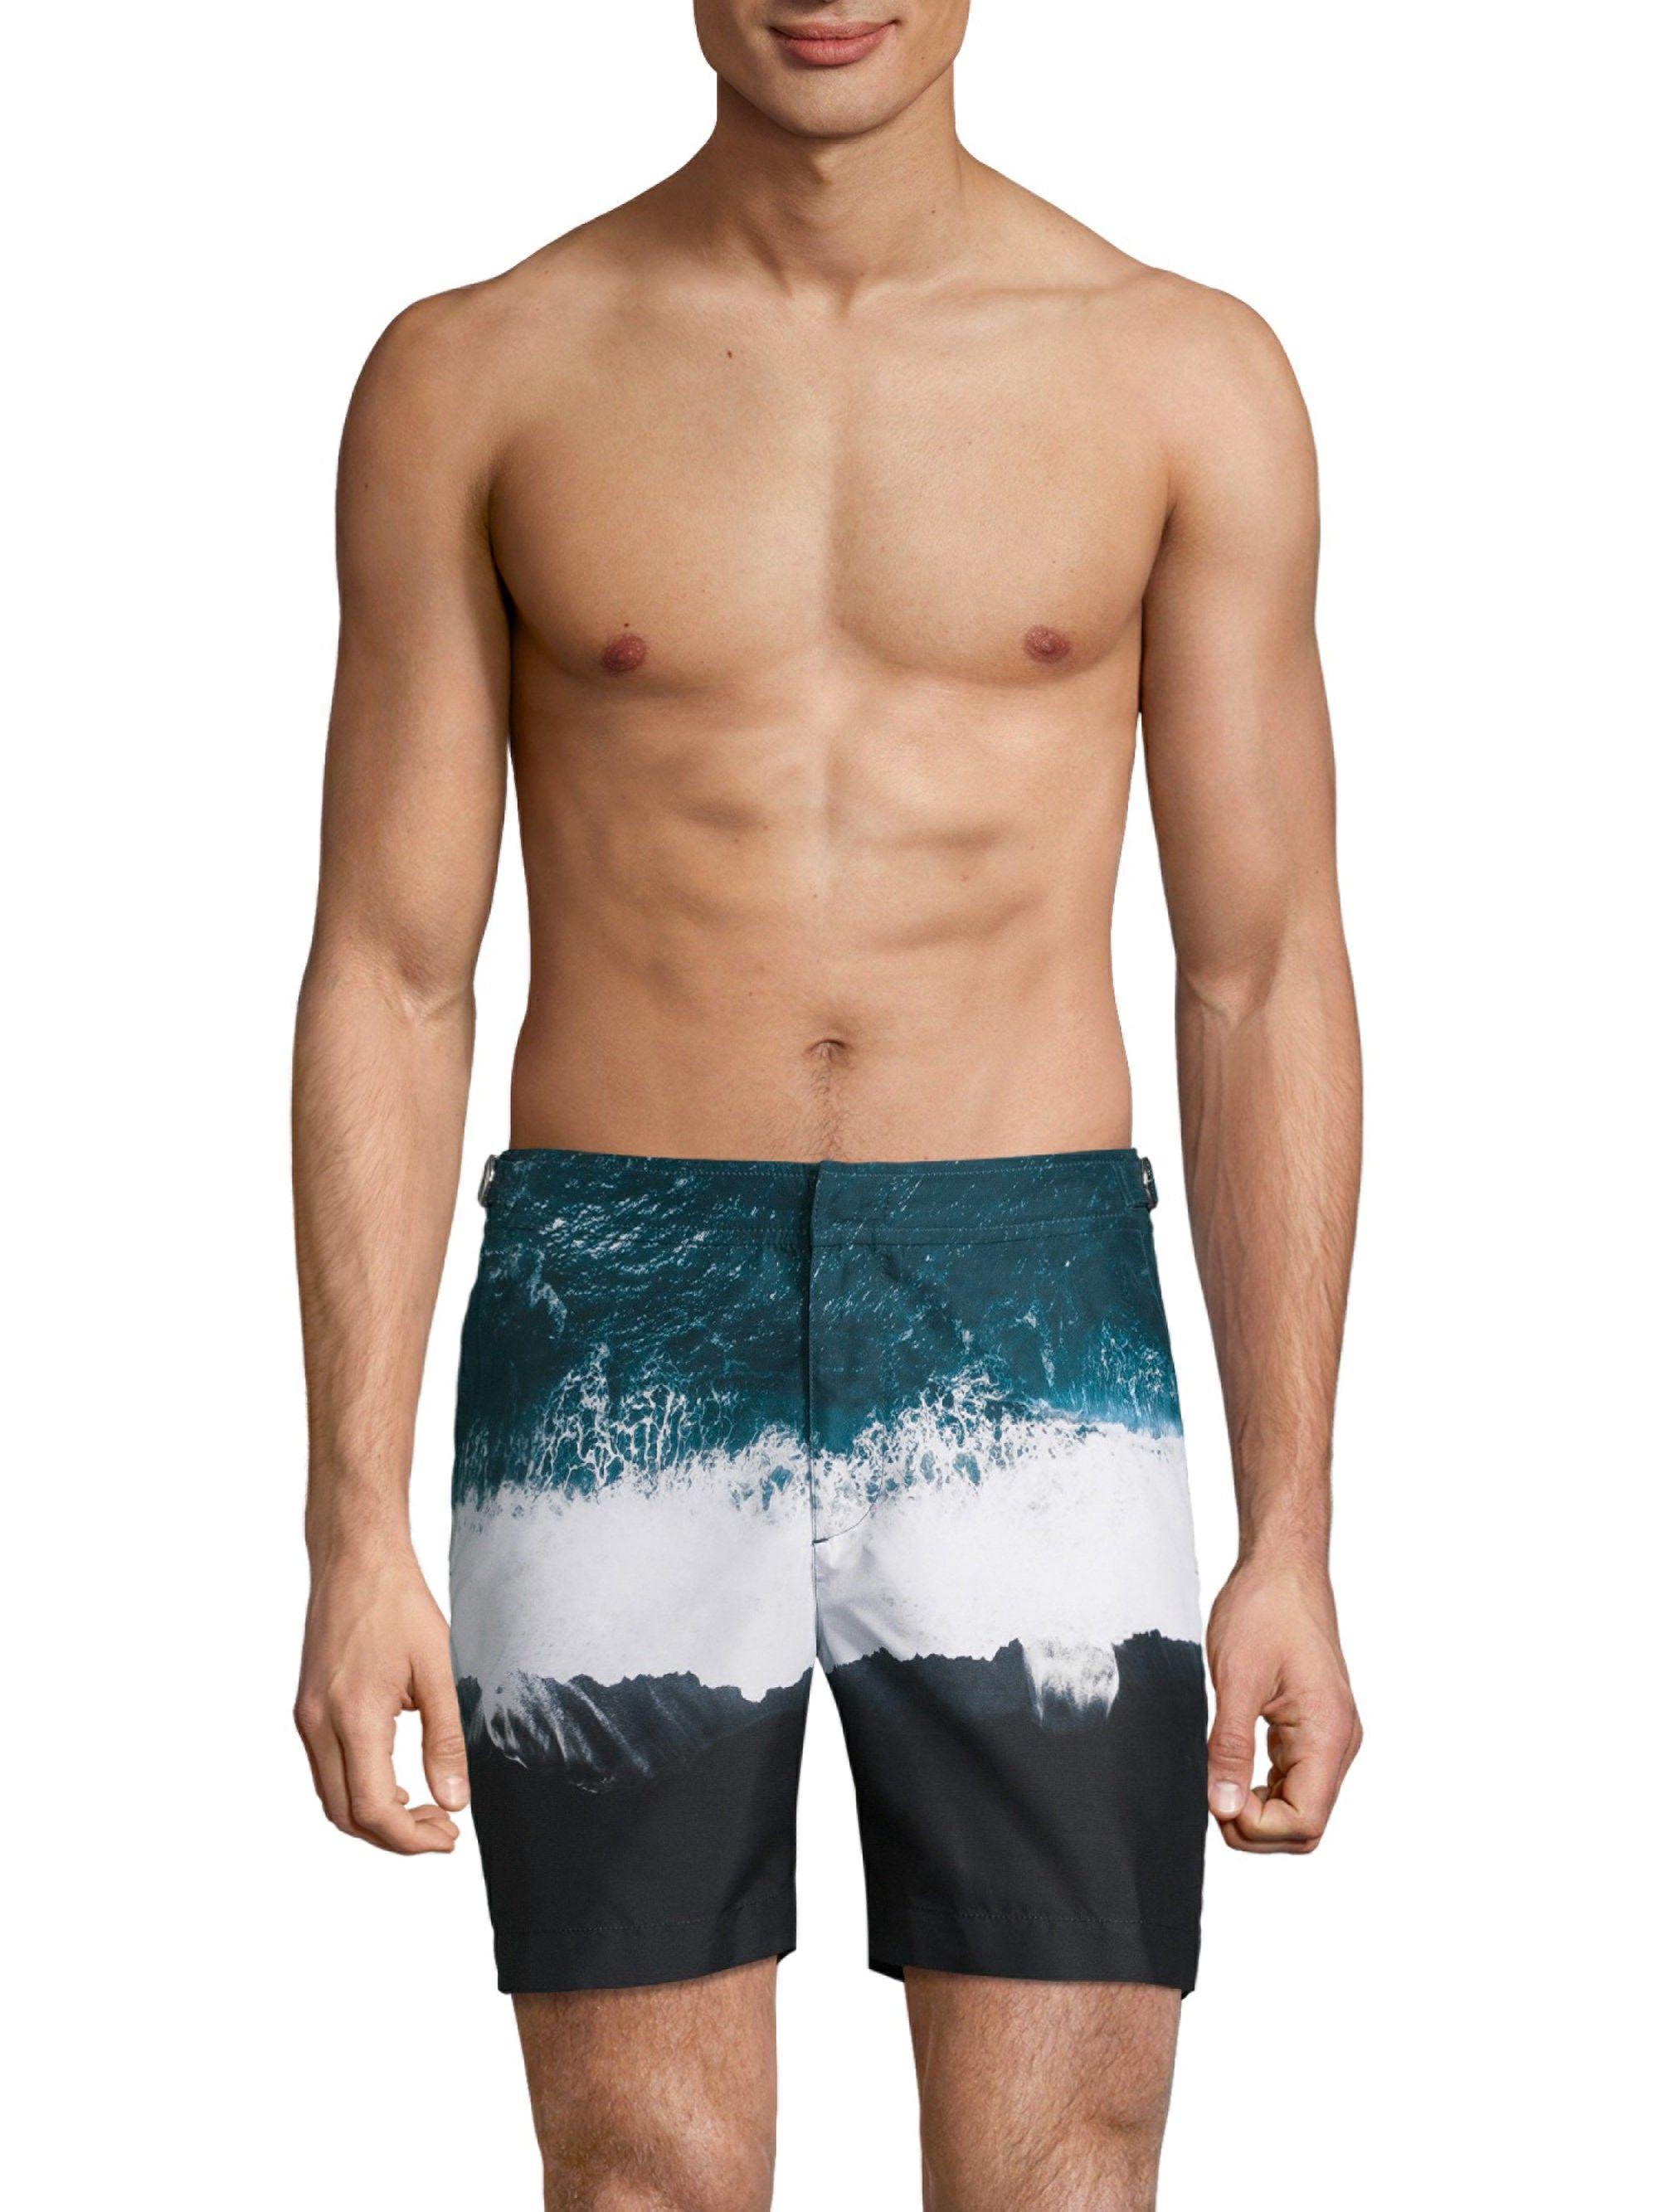 bfe01946e9ecc Orlebar Brown Oceans Print Board Shorts - Edge 32 | Products | Swim ...